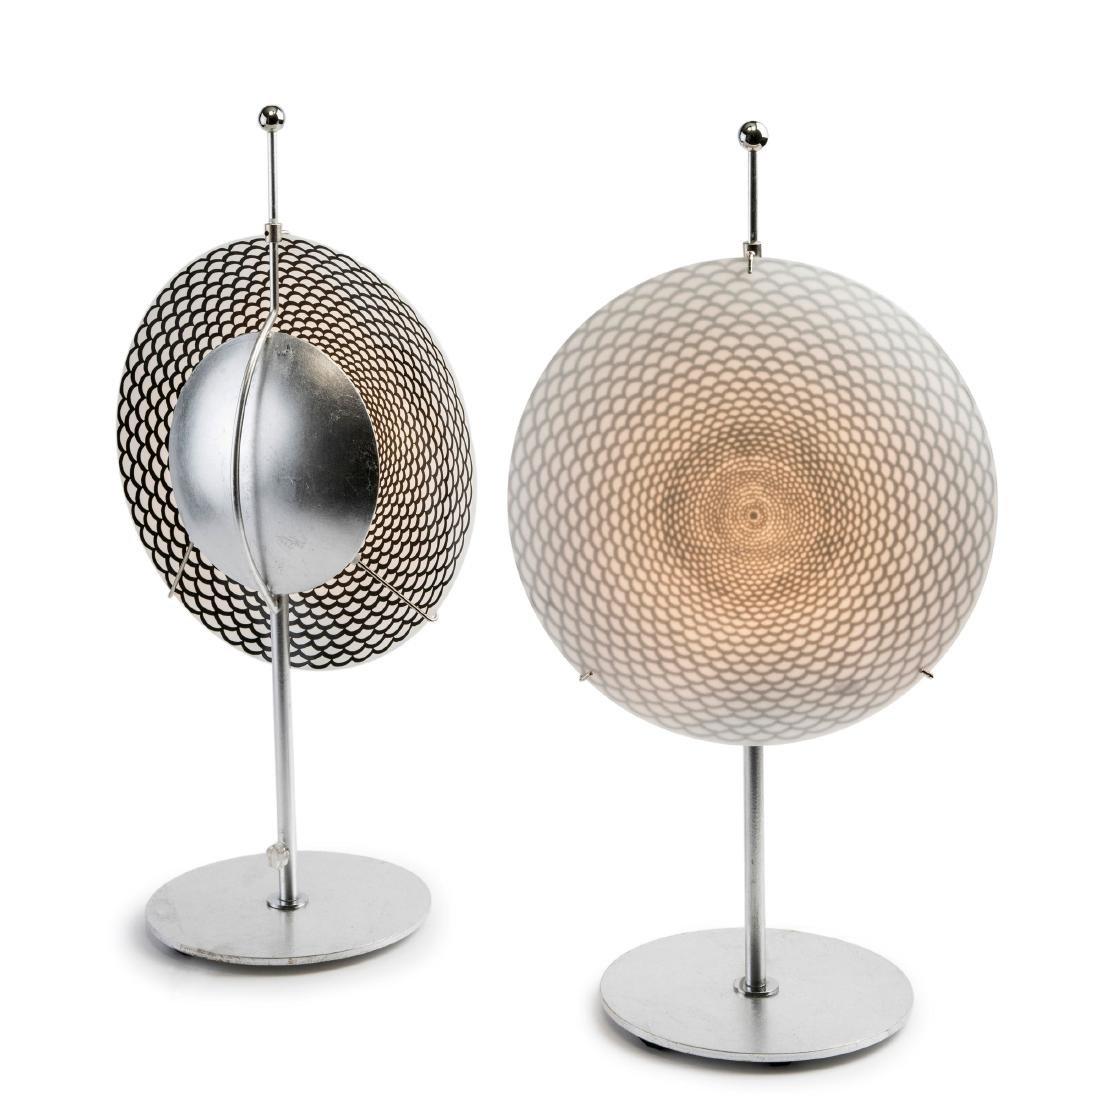 Two 'Ottica' table lights, c. 1995